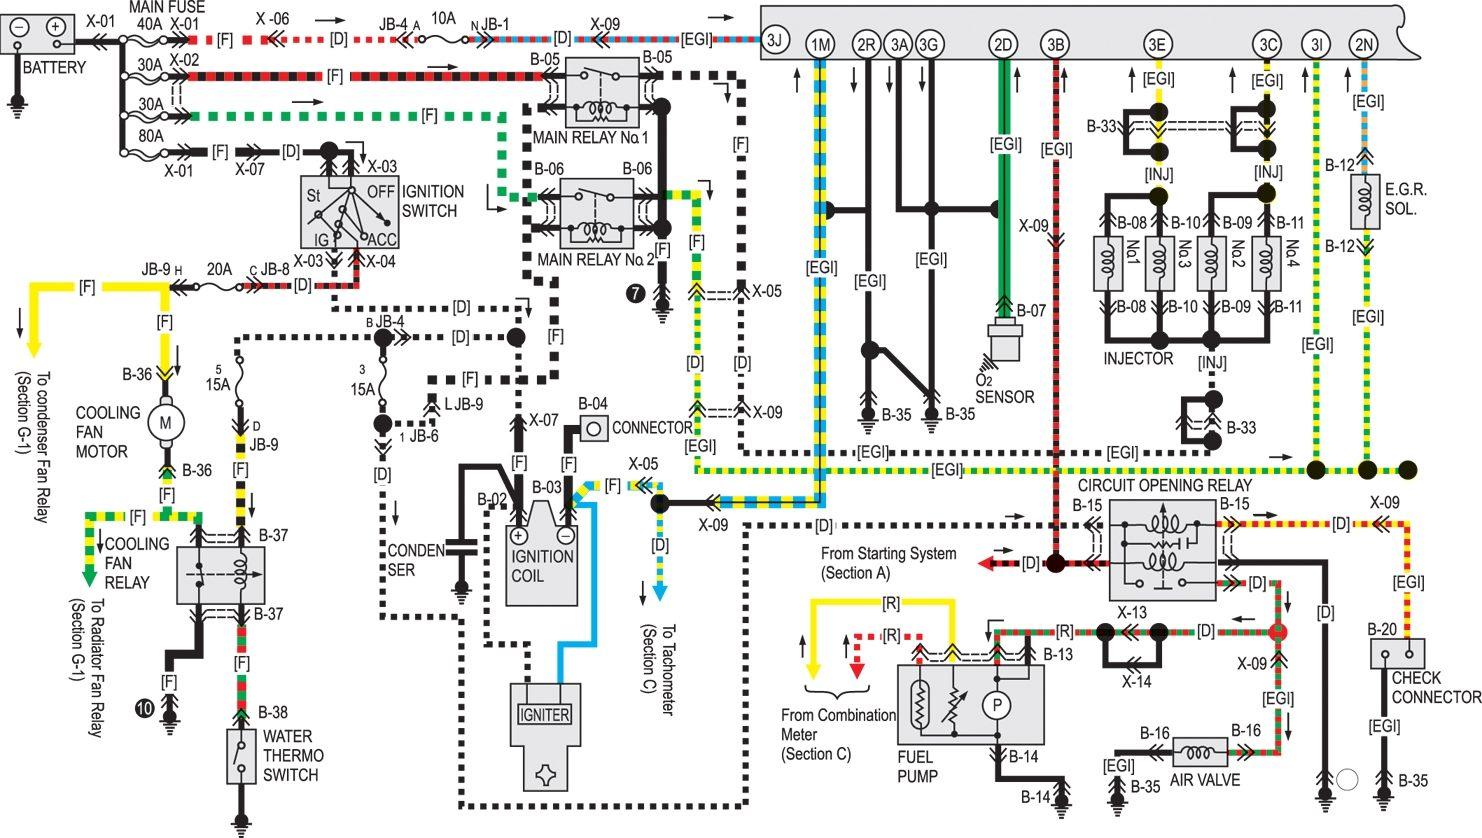 hight resolution of 2009 mazda 2 wiring diagram wiring librarymazda 2 dy wiring diagram 9